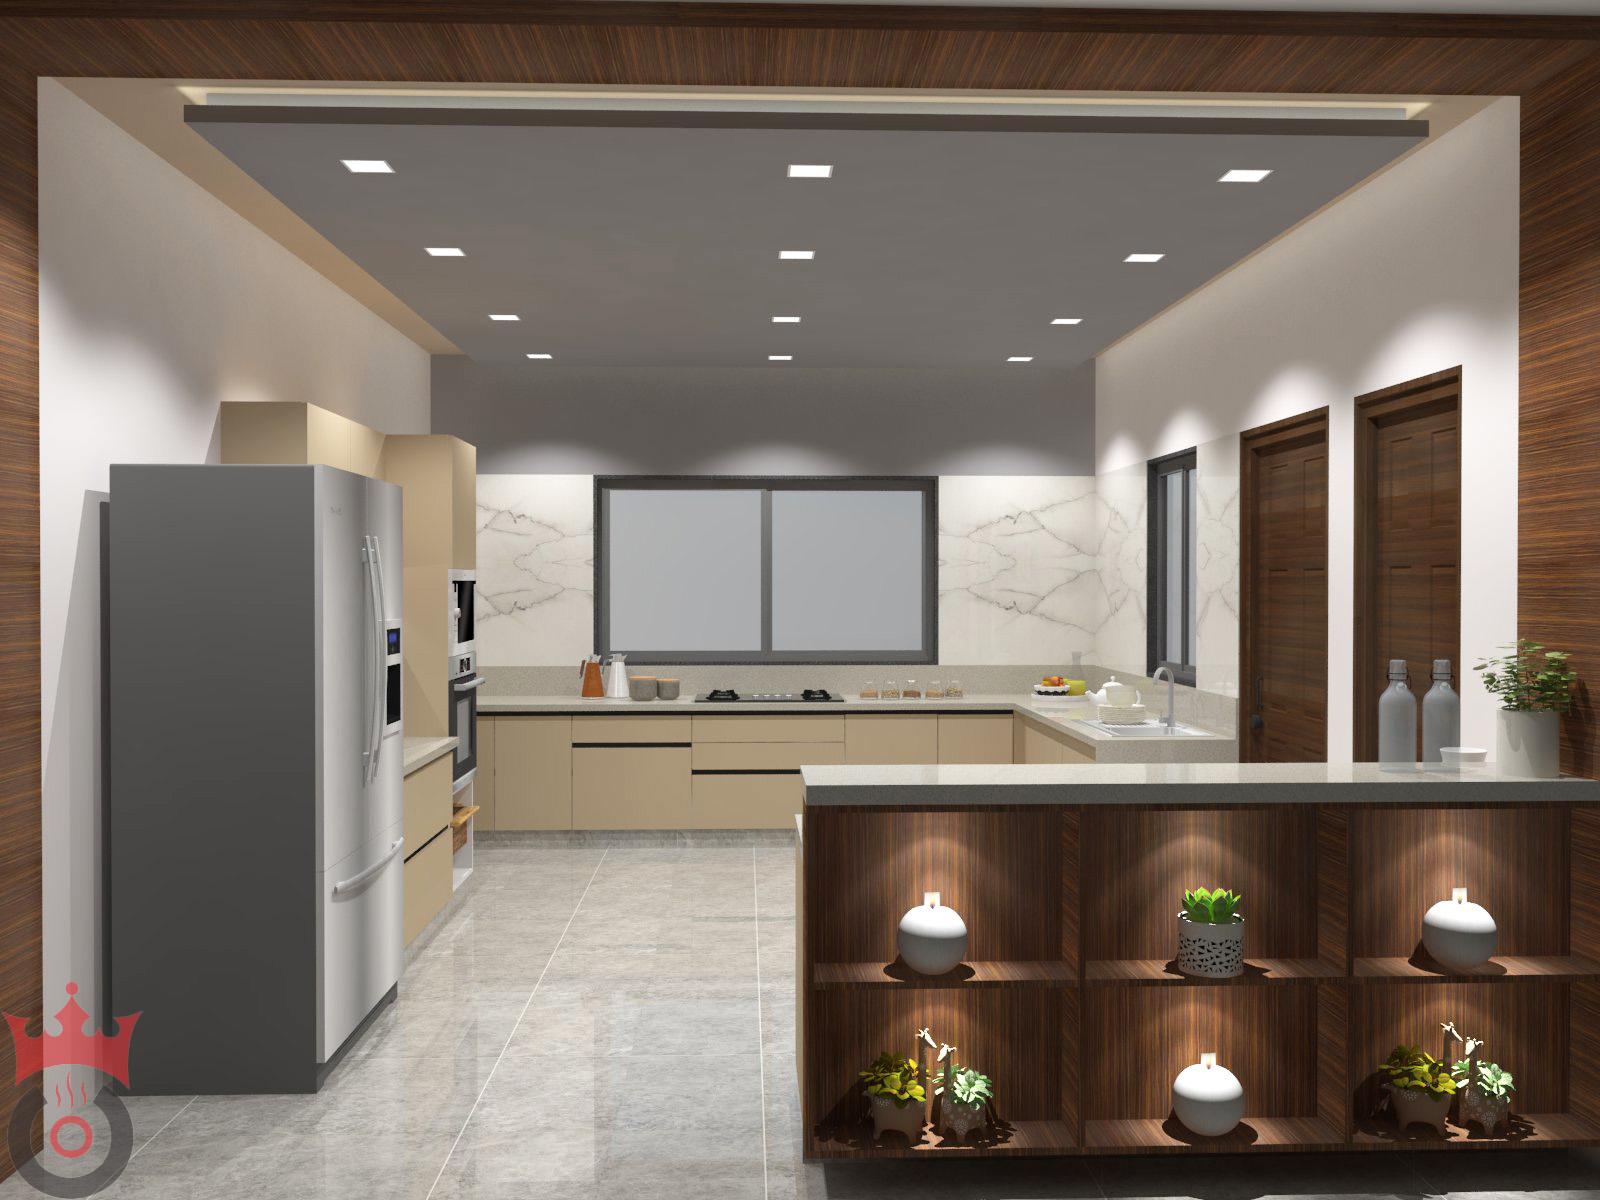 Rich Sandal Modular Kitchens - Design By Coronet Kitchens